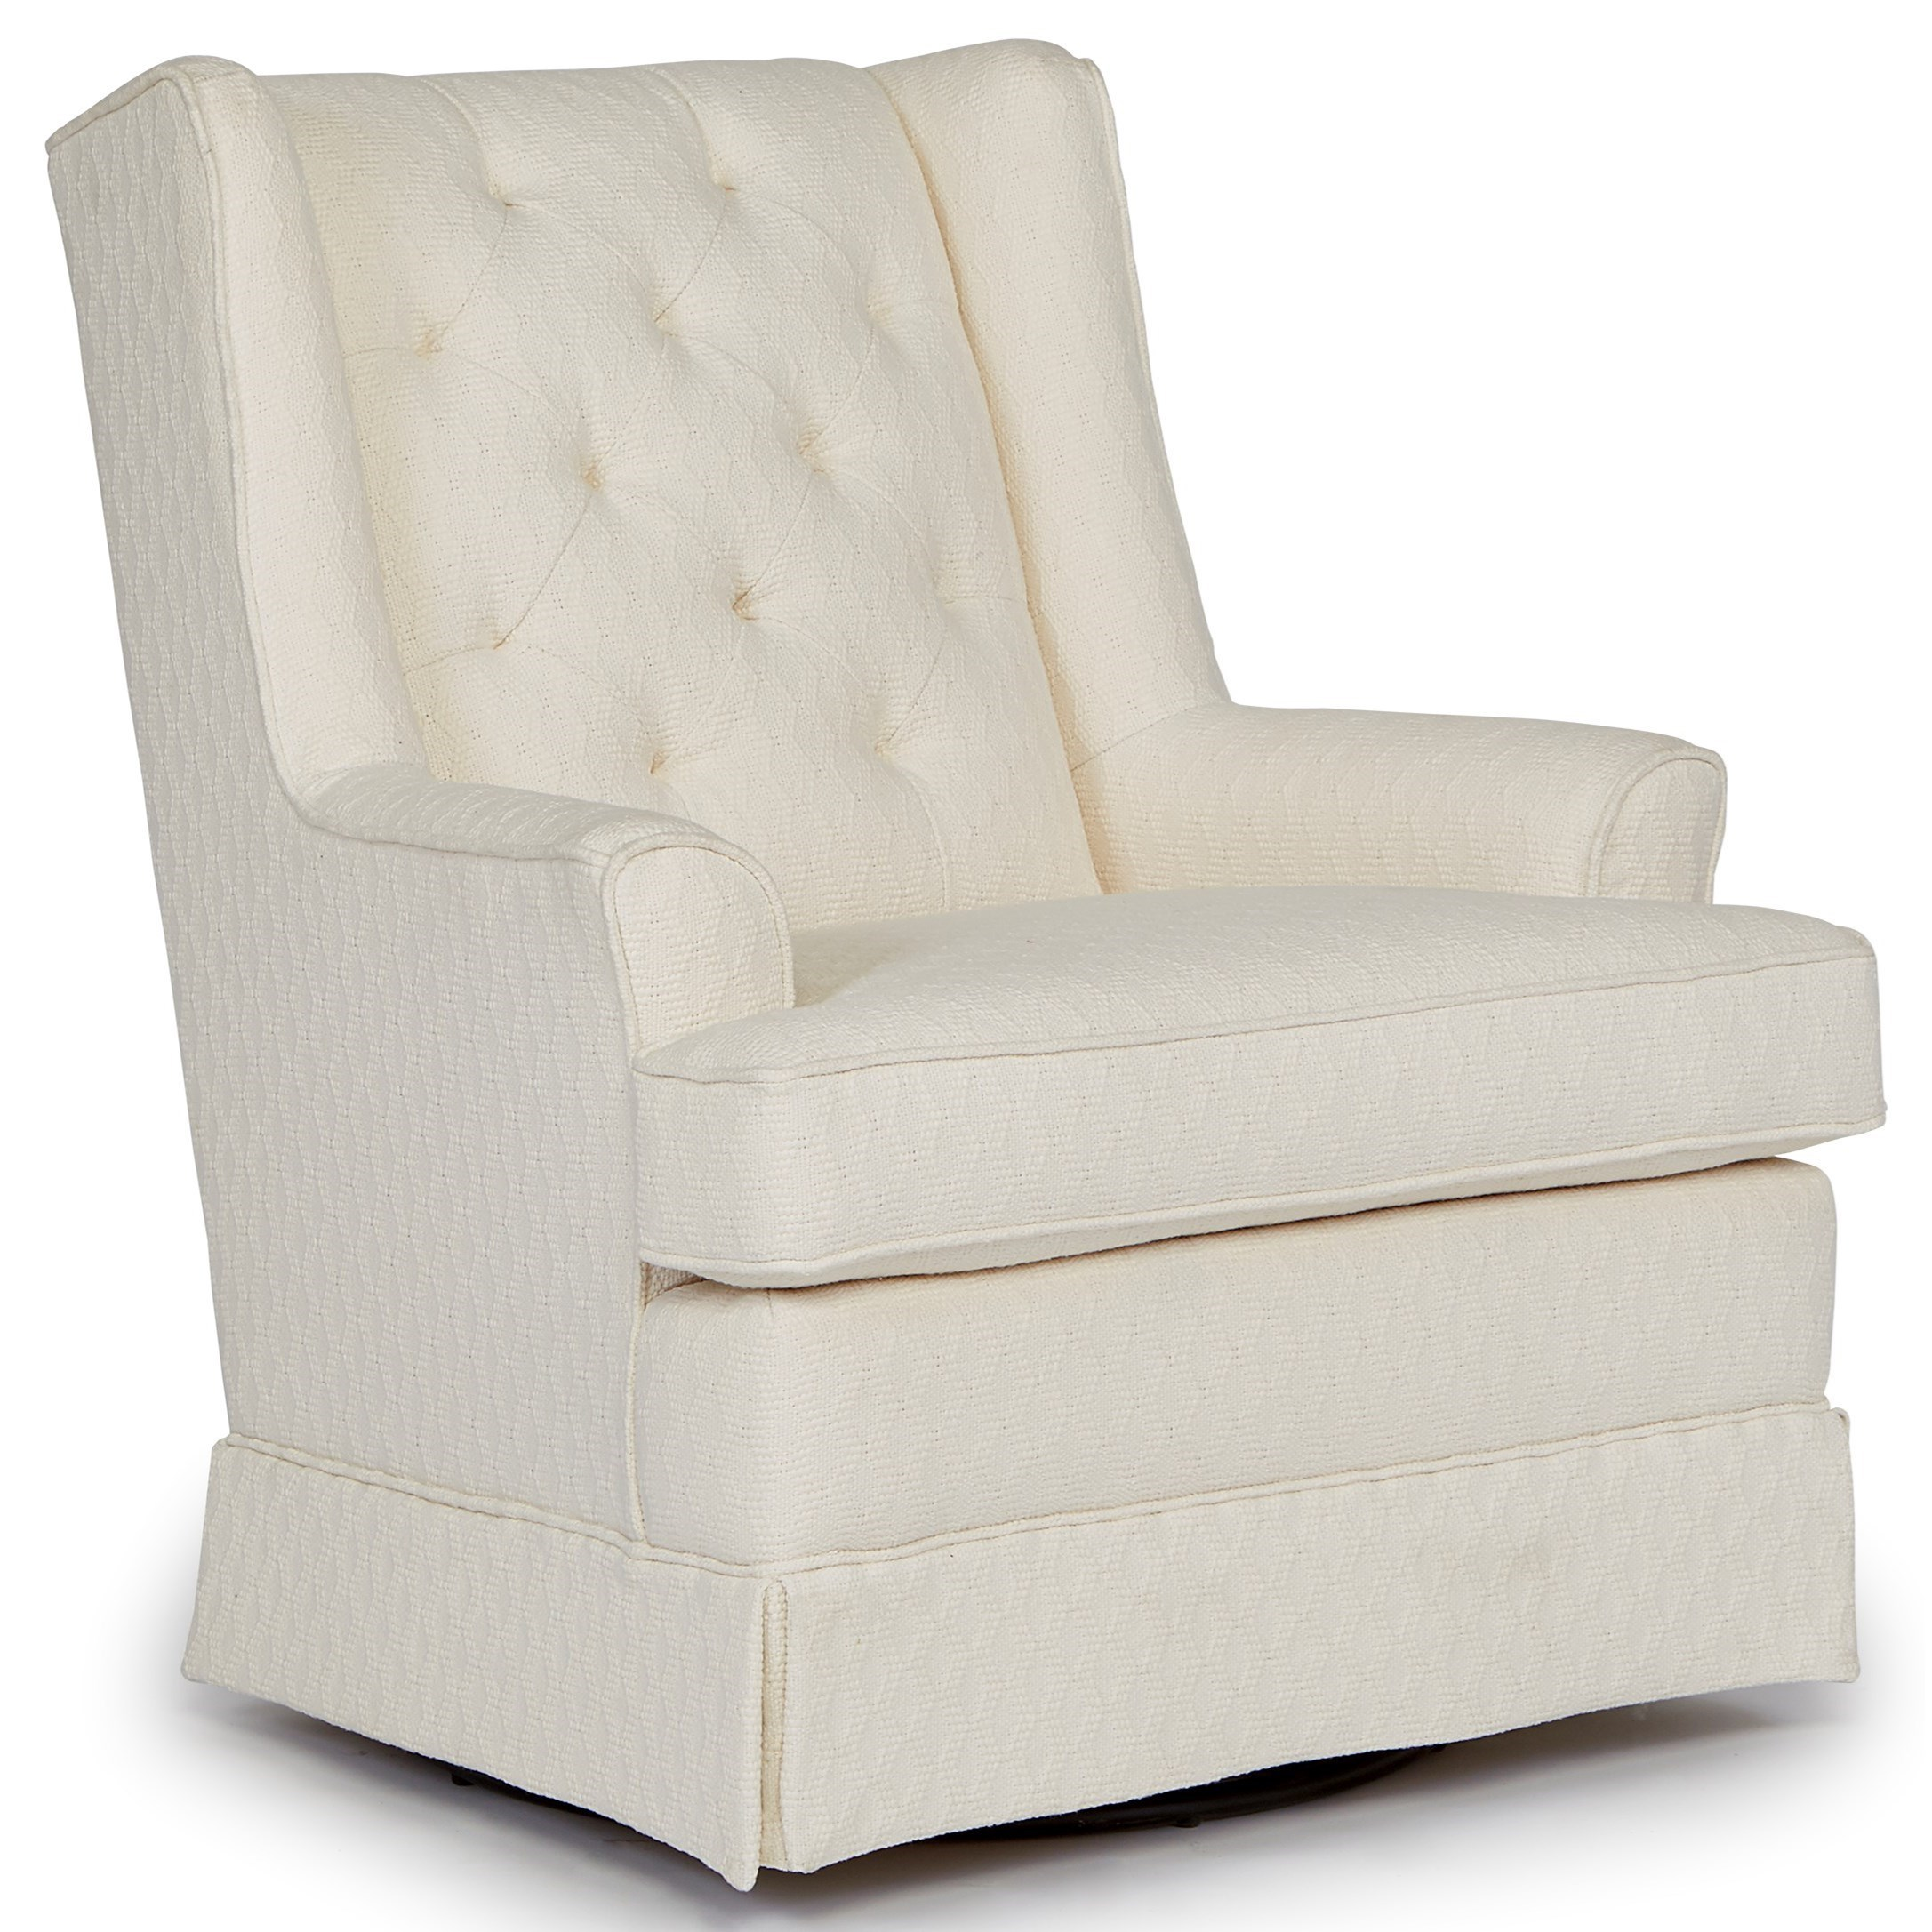 Best Home Furnishings Swivel Glide ChairsSwivel Glider